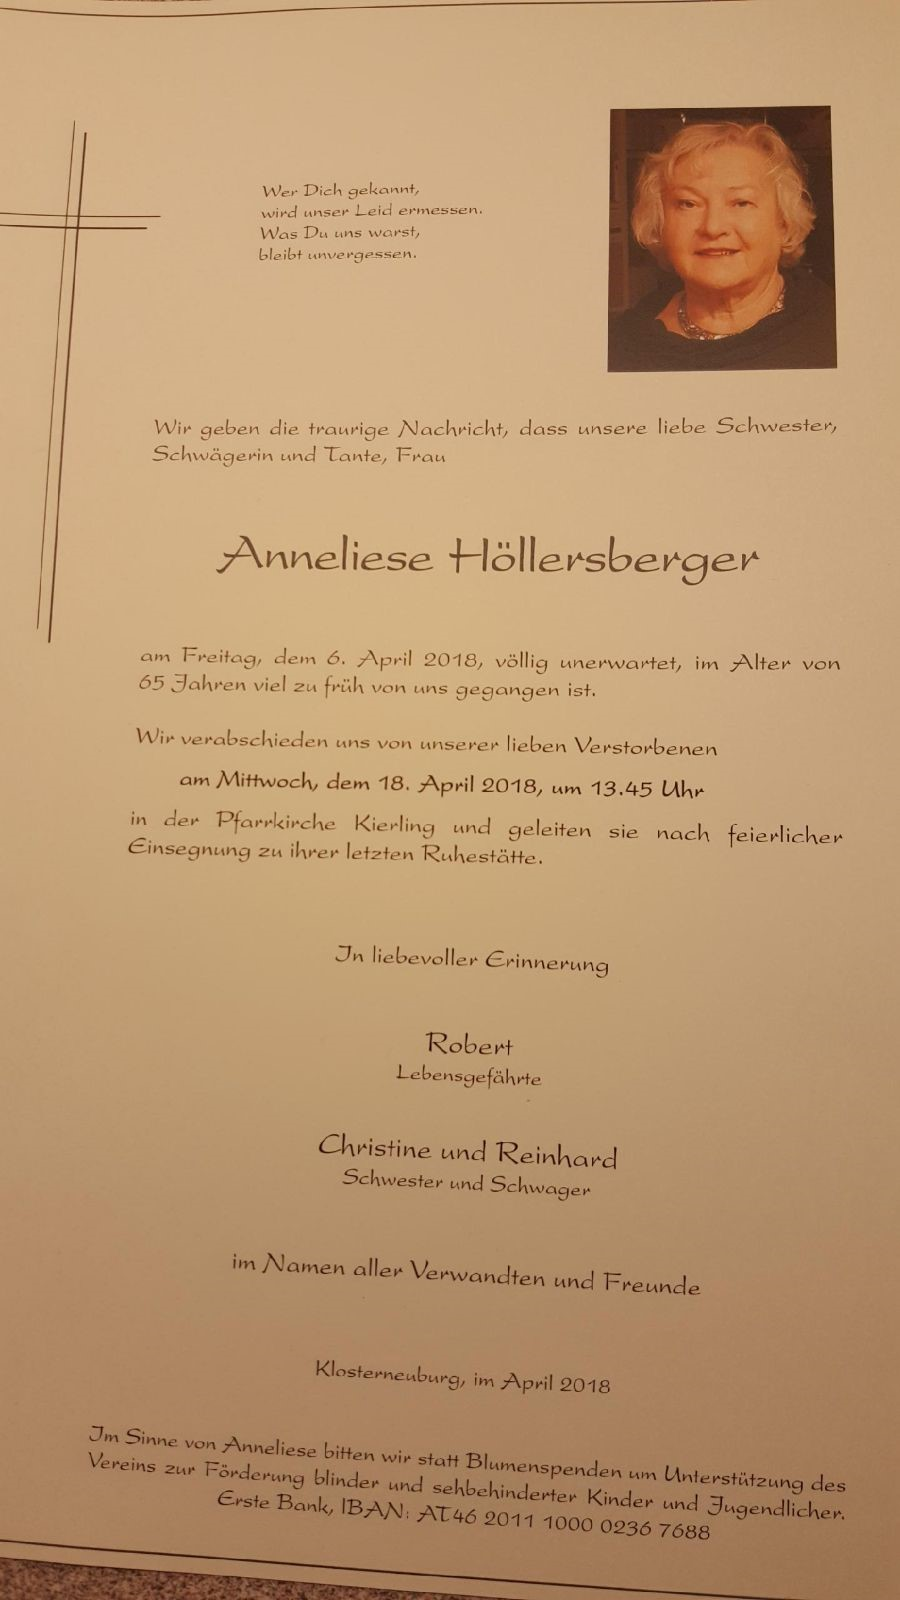 Hoellersberger-Anneliese-Parte